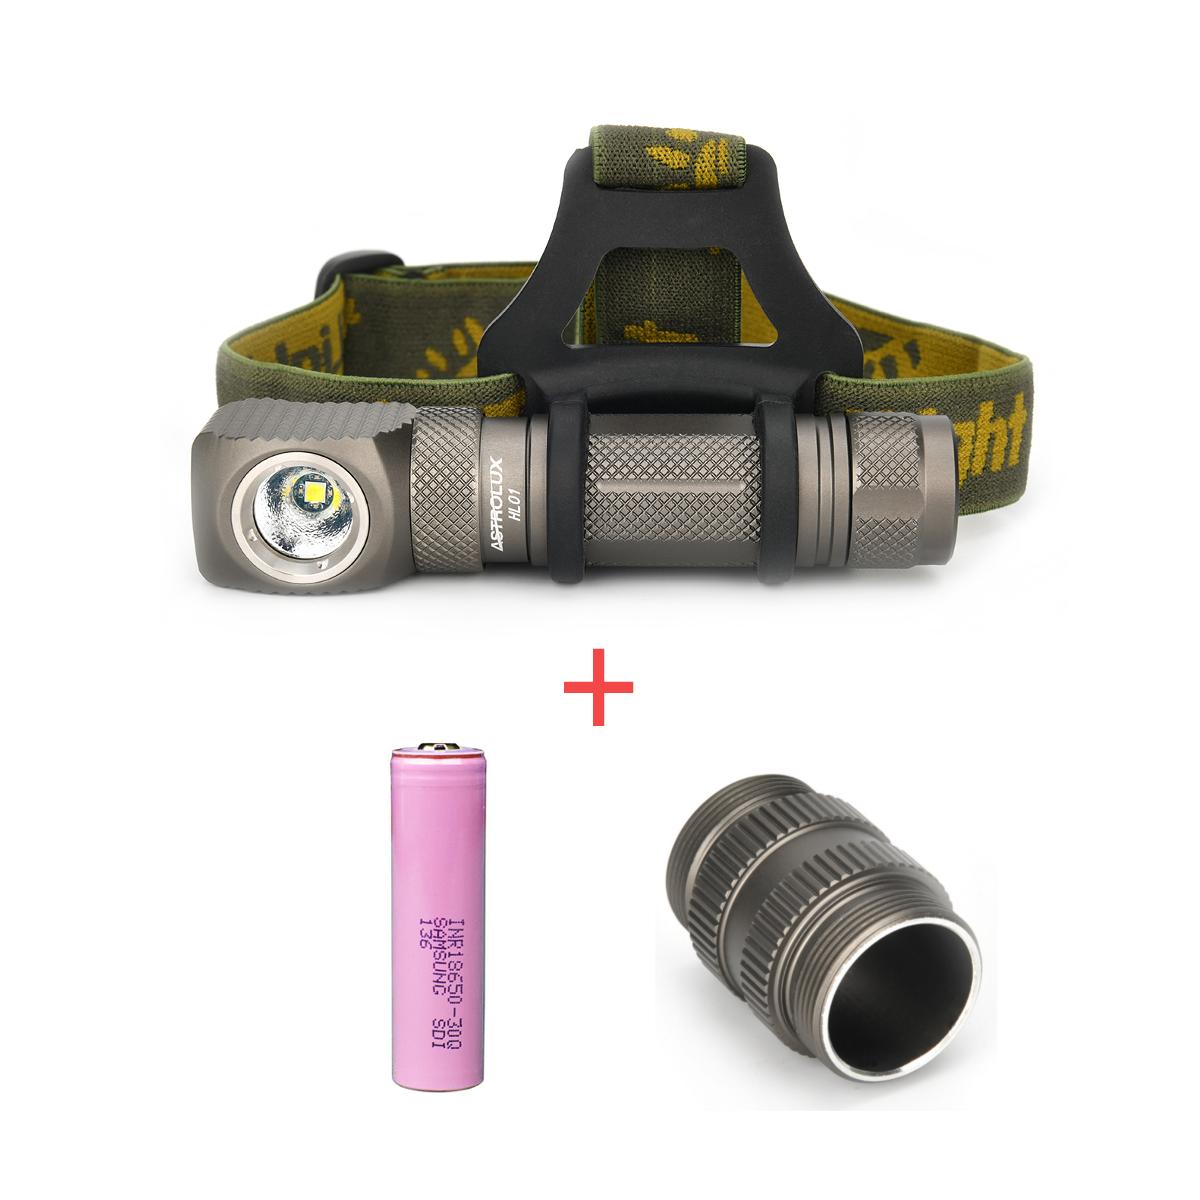 Astrolux HL01 1200lm Anduril UI Magnetic Headlamp L-shape Flashlight + 30Q 3000mAh 18650 Battery